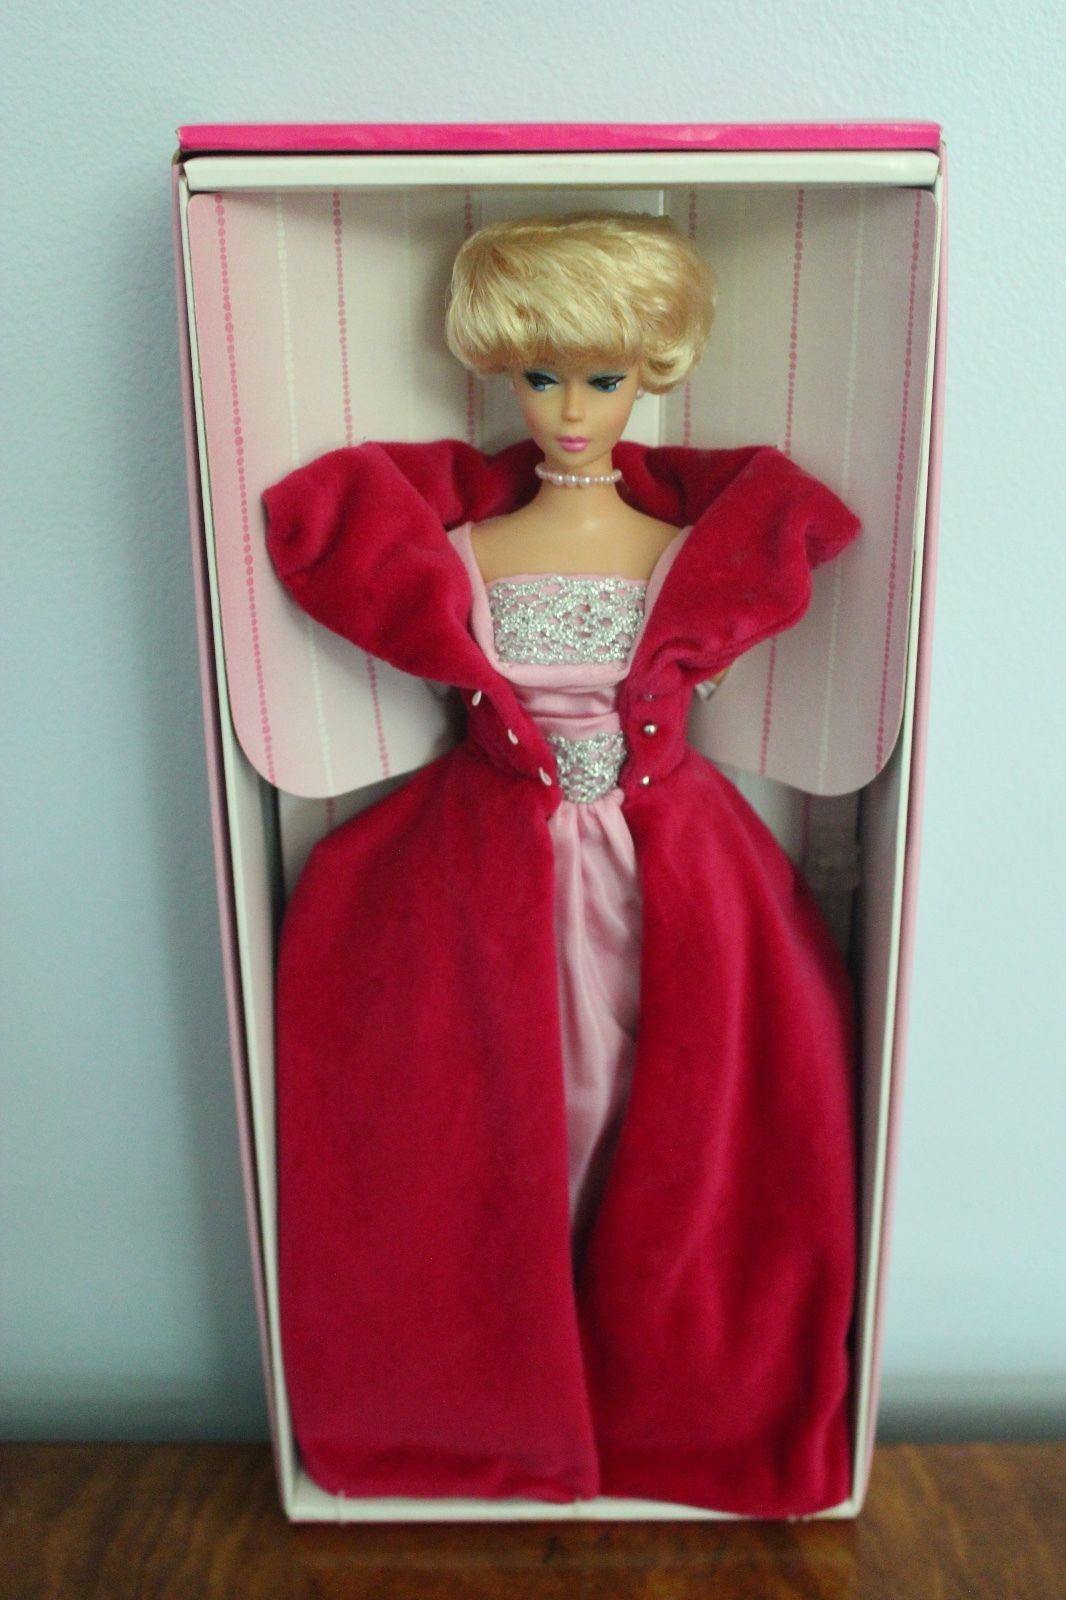 SOPHISTICATED LADY 1999 迷人貴婦 1963年復刻 珍藏版芭比娃娃